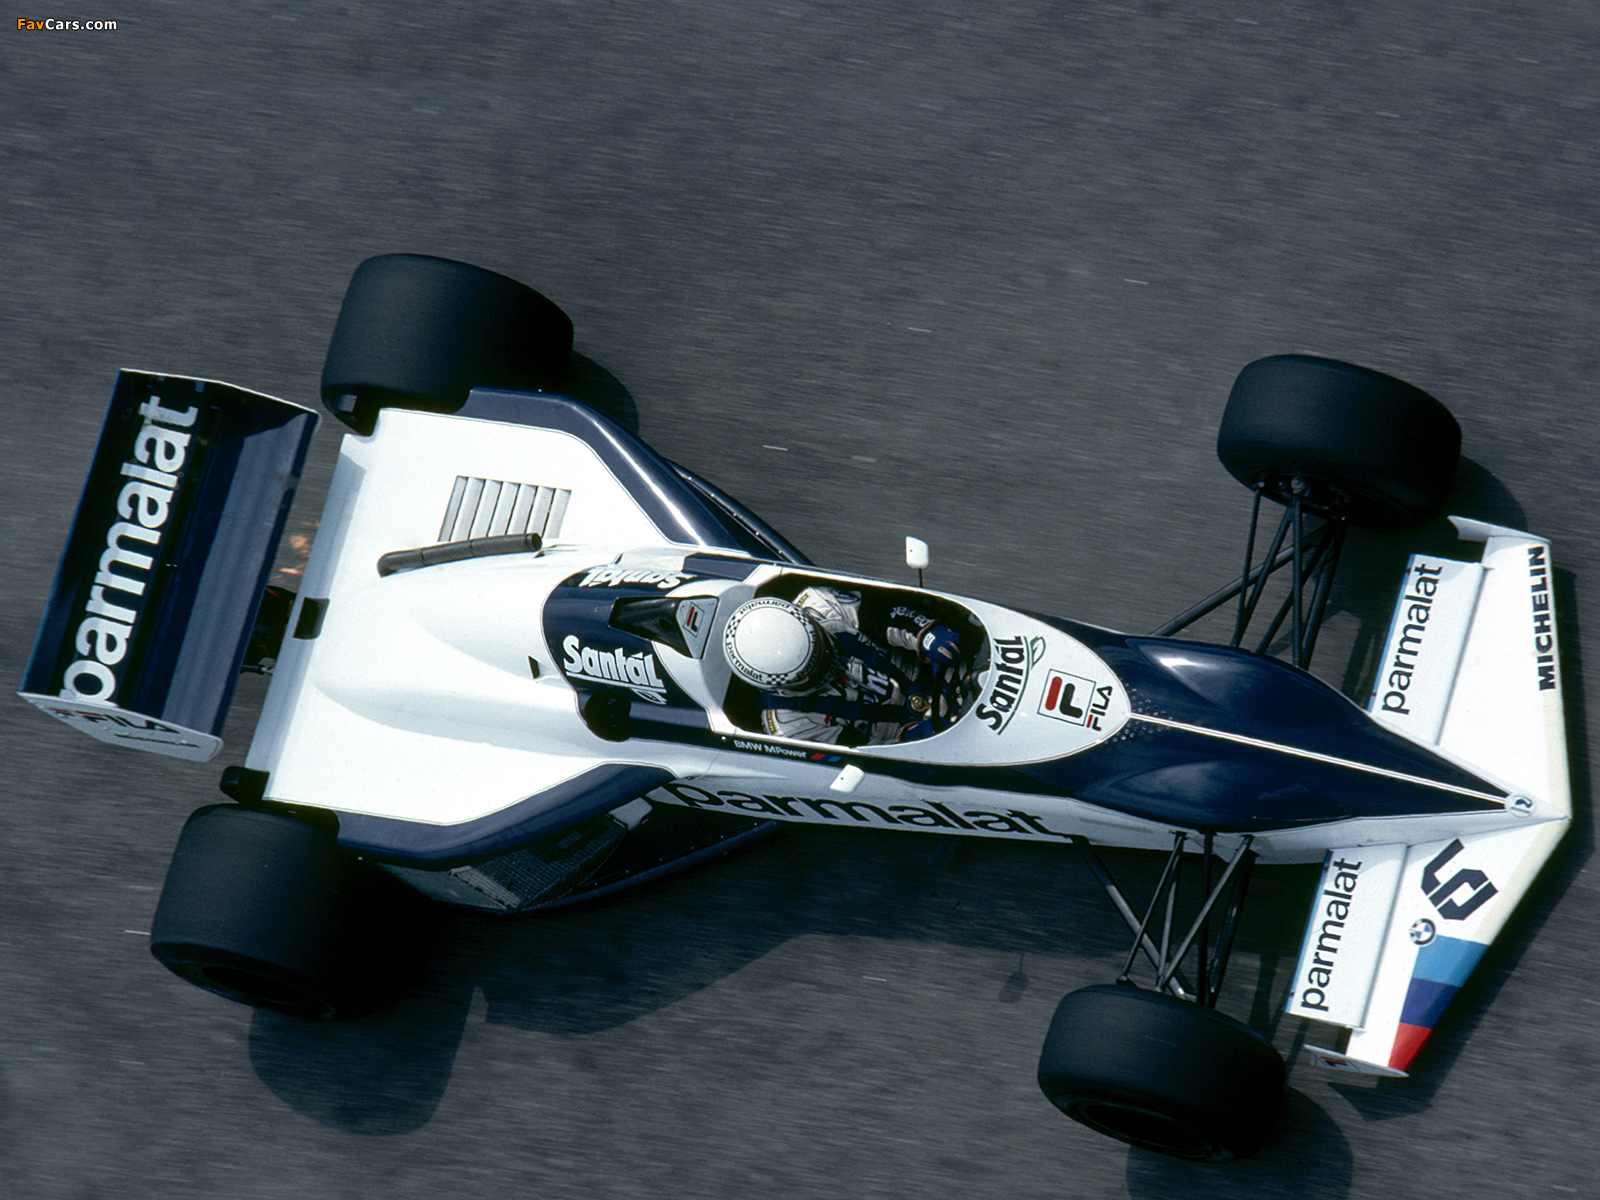 Brabham Bt52 1983 Wallpapers 1600x1200